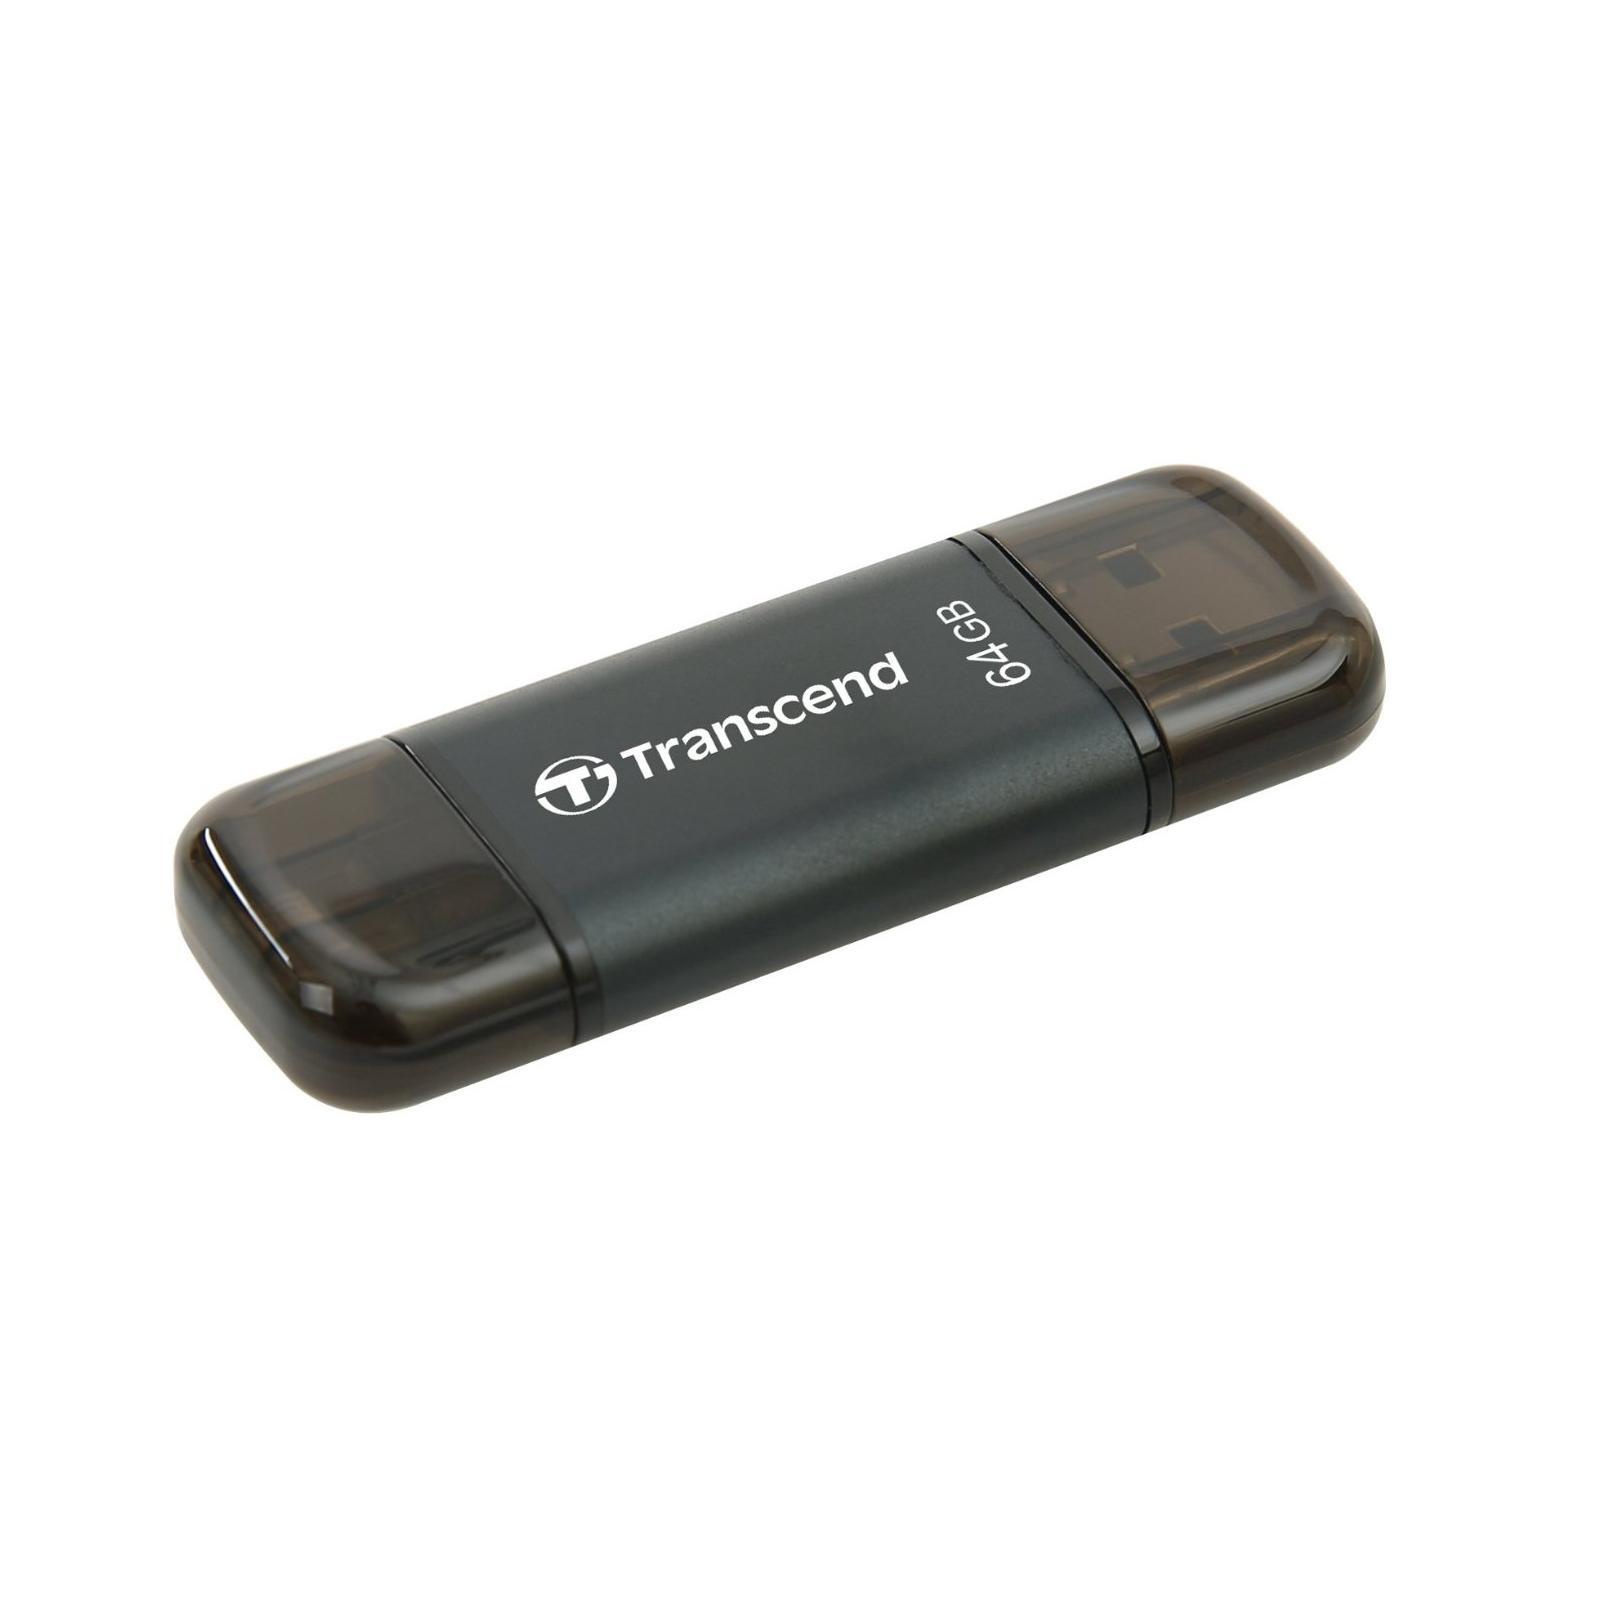 USB флеш накопитель Transcend 64GB JetDrive Go 300 Black USB 3.1 (TS64GJDG300K) изображение 2